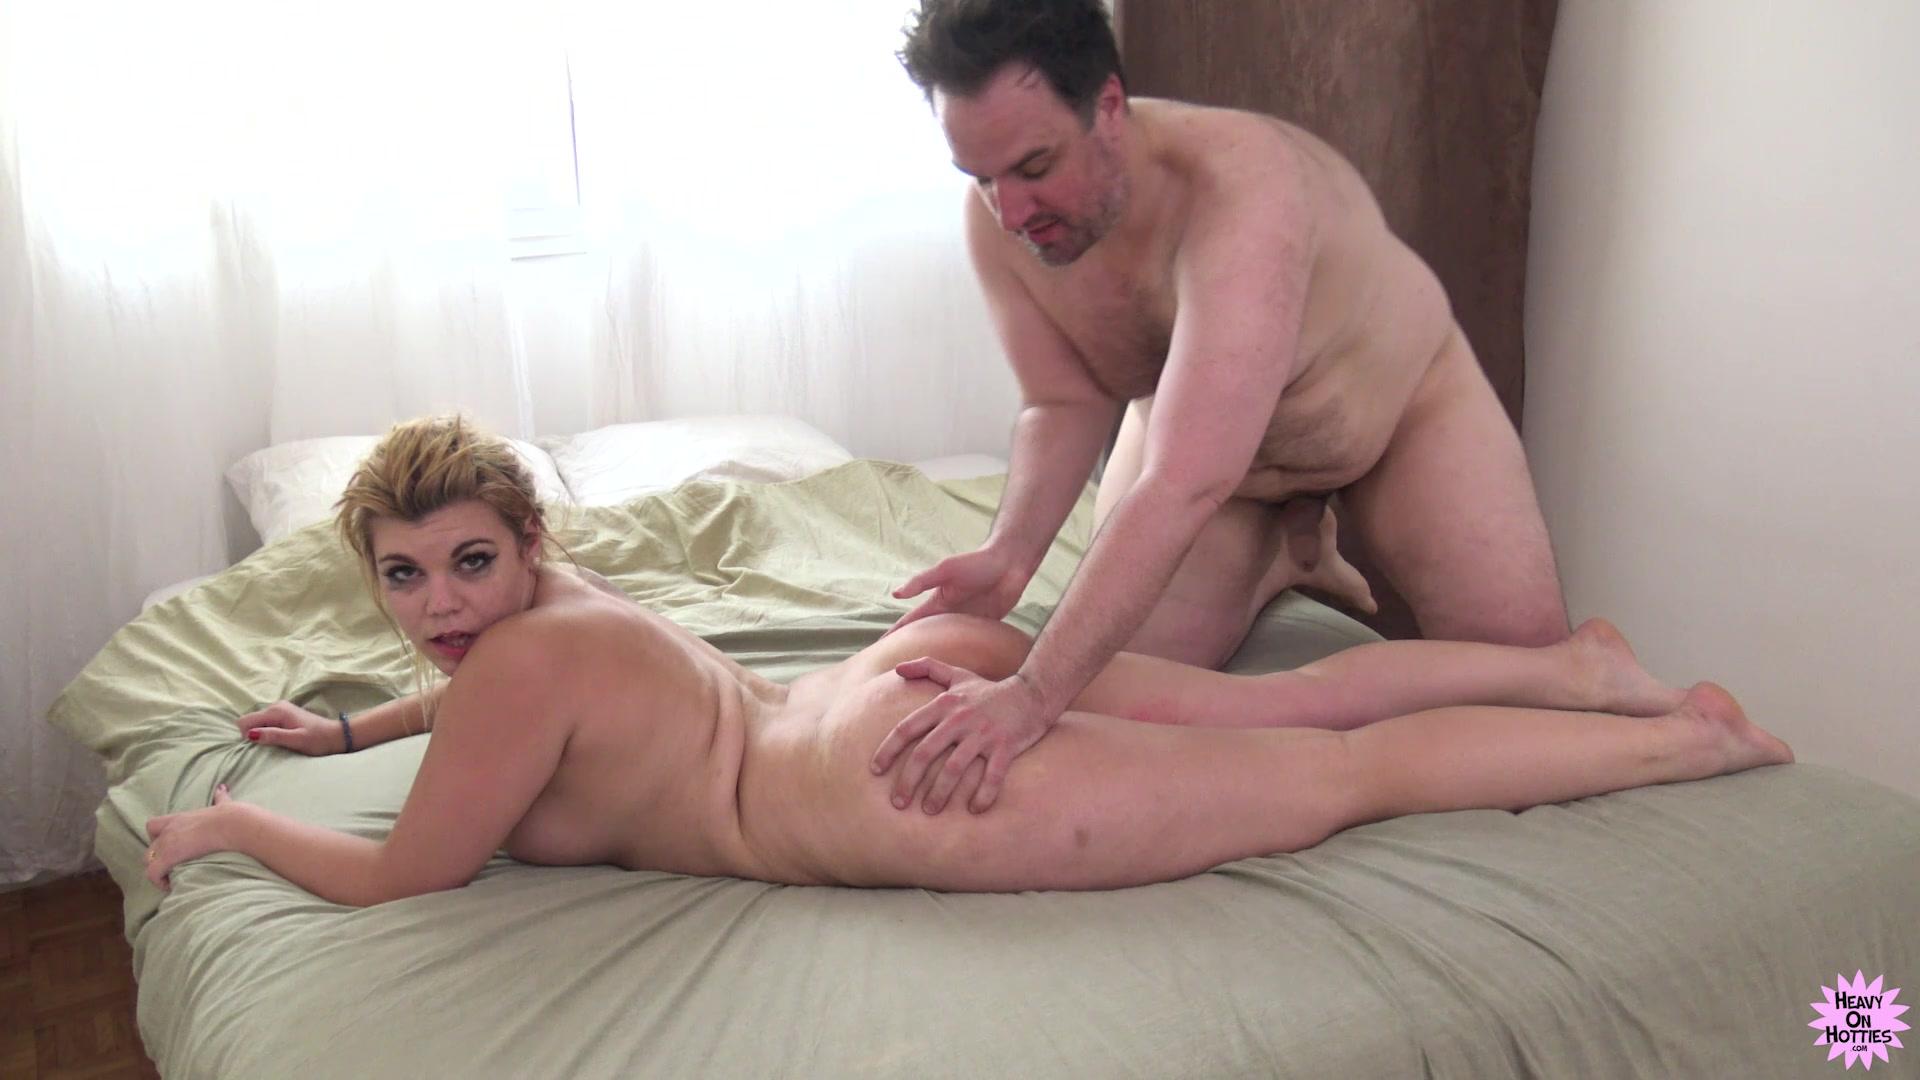 Bbw House Porn Hd homepage - heavy on hotties